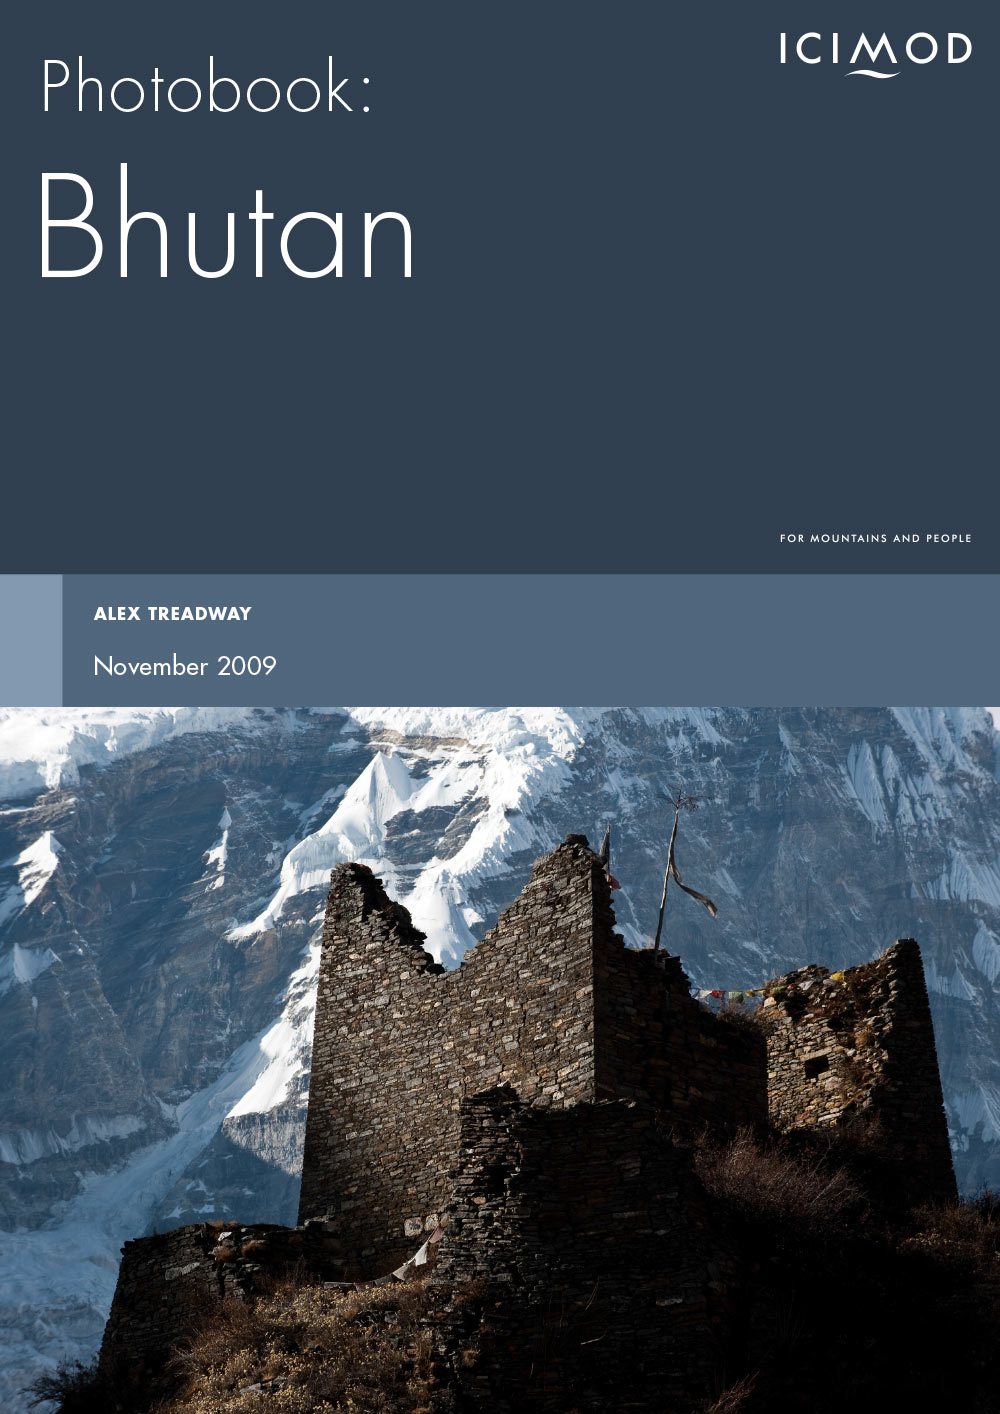 BhutanPhotobook cover